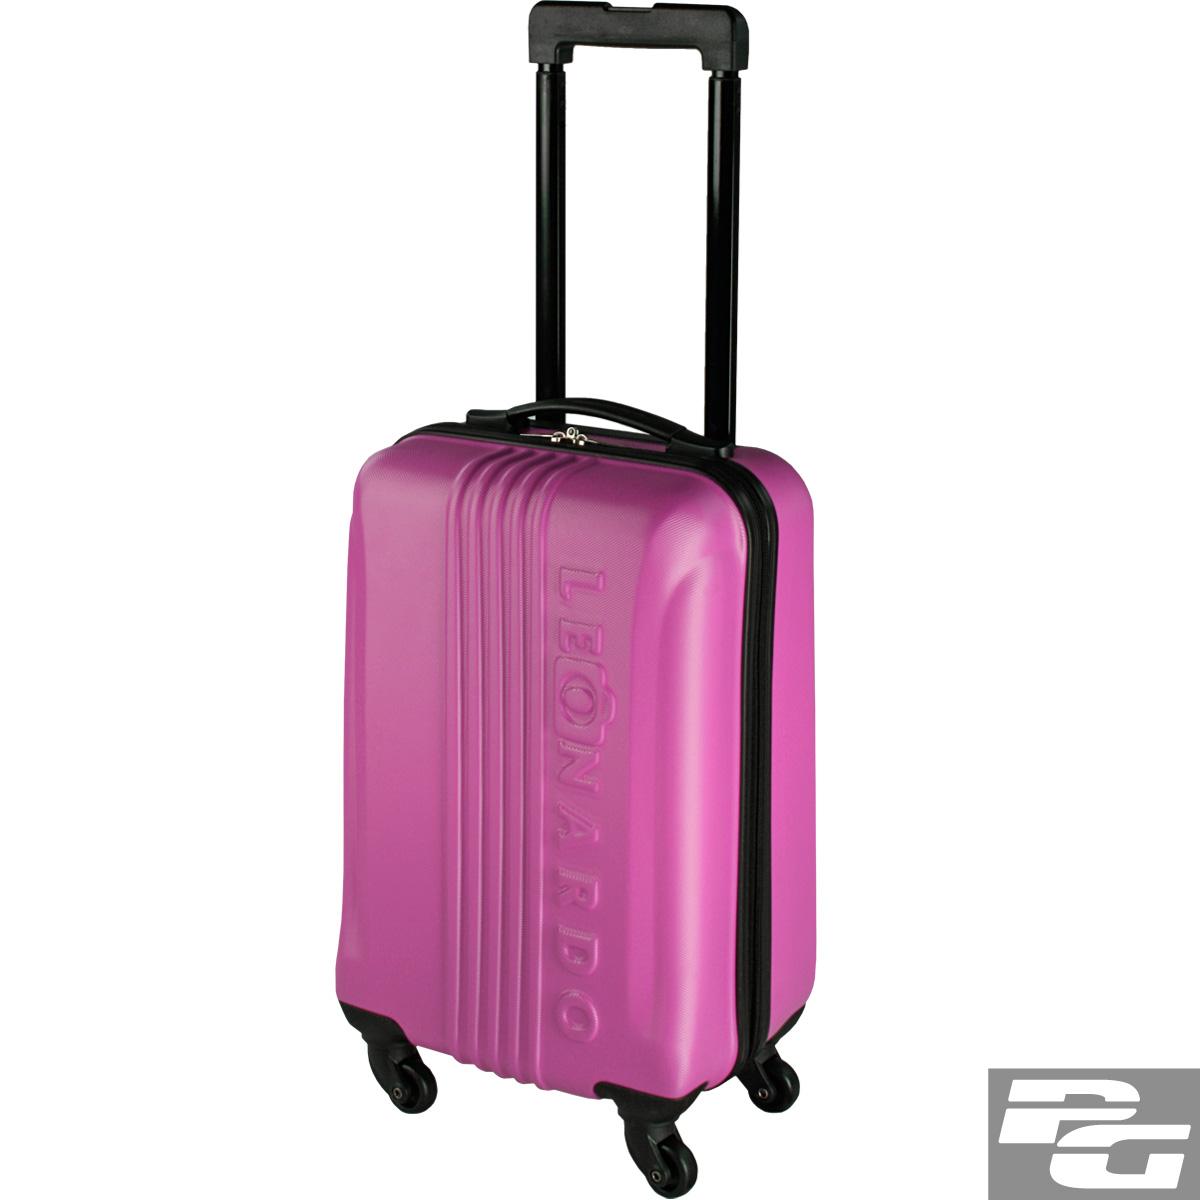 leonardo koffer reisekoffer trolley koffer hartschale handgep ck boardcase ebay. Black Bedroom Furniture Sets. Home Design Ideas